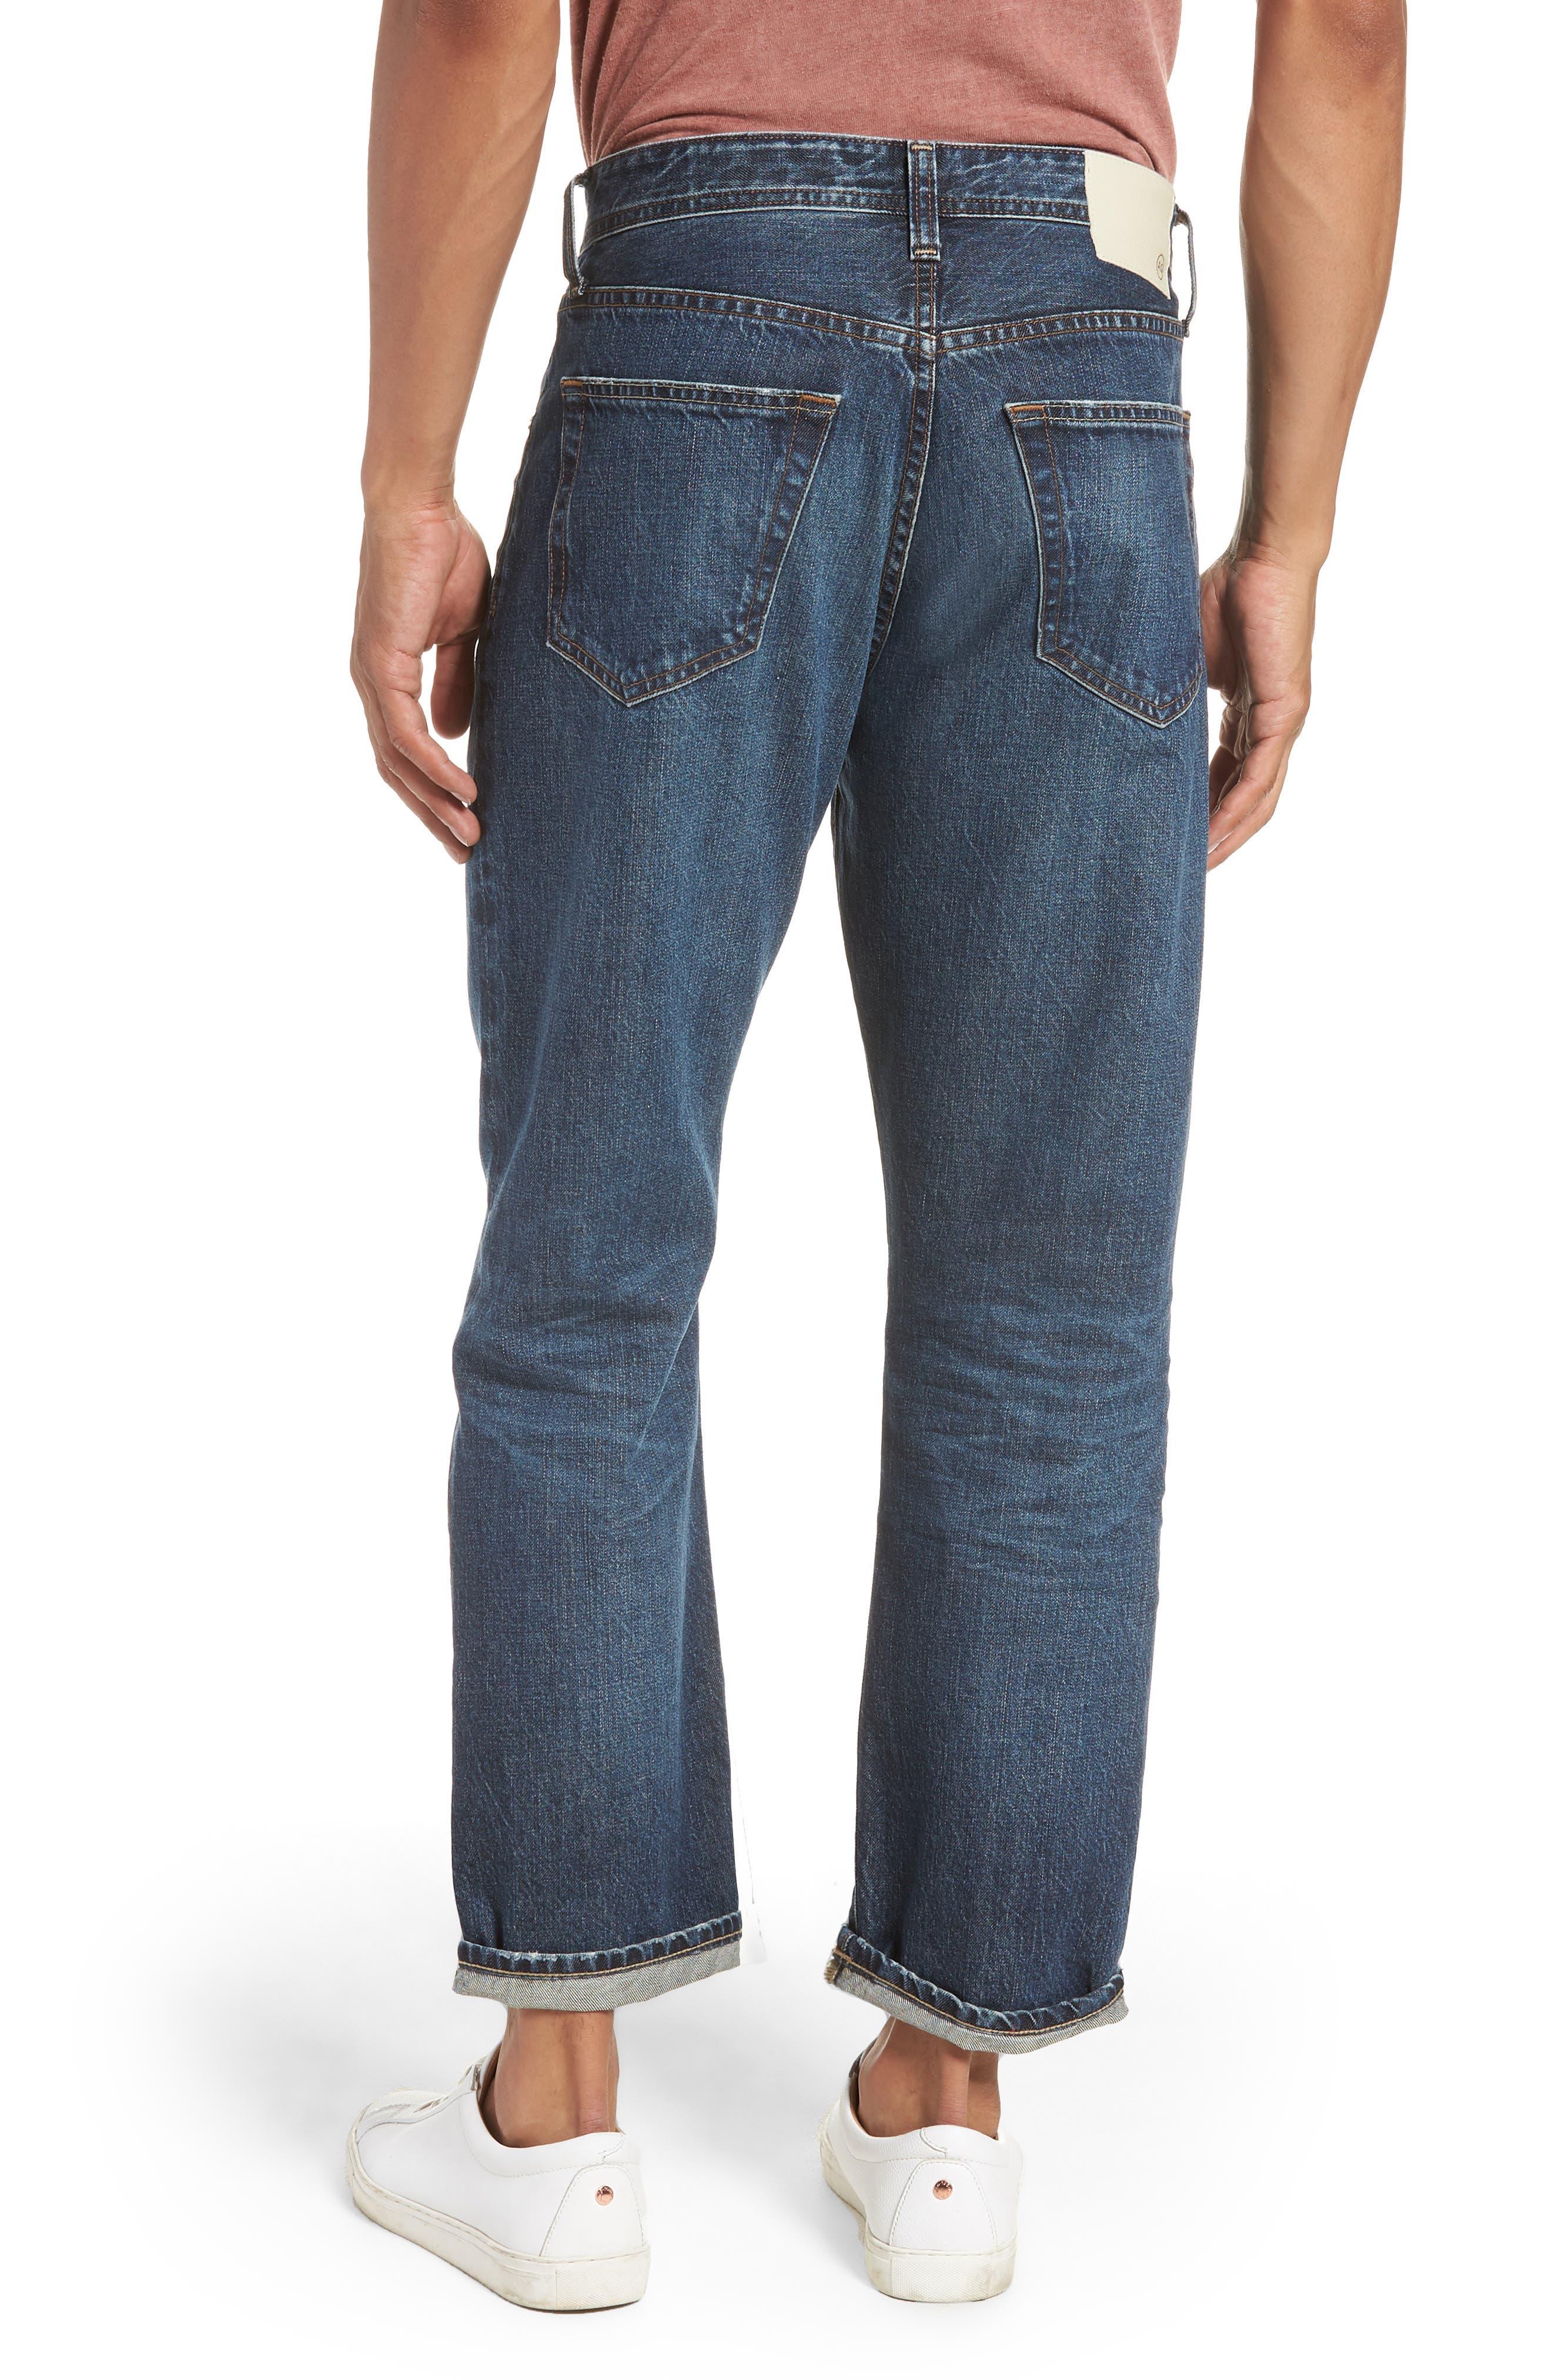 Turner Crop Jeans,                             Alternate thumbnail 2, color,                             5 YEARS WAYFARER